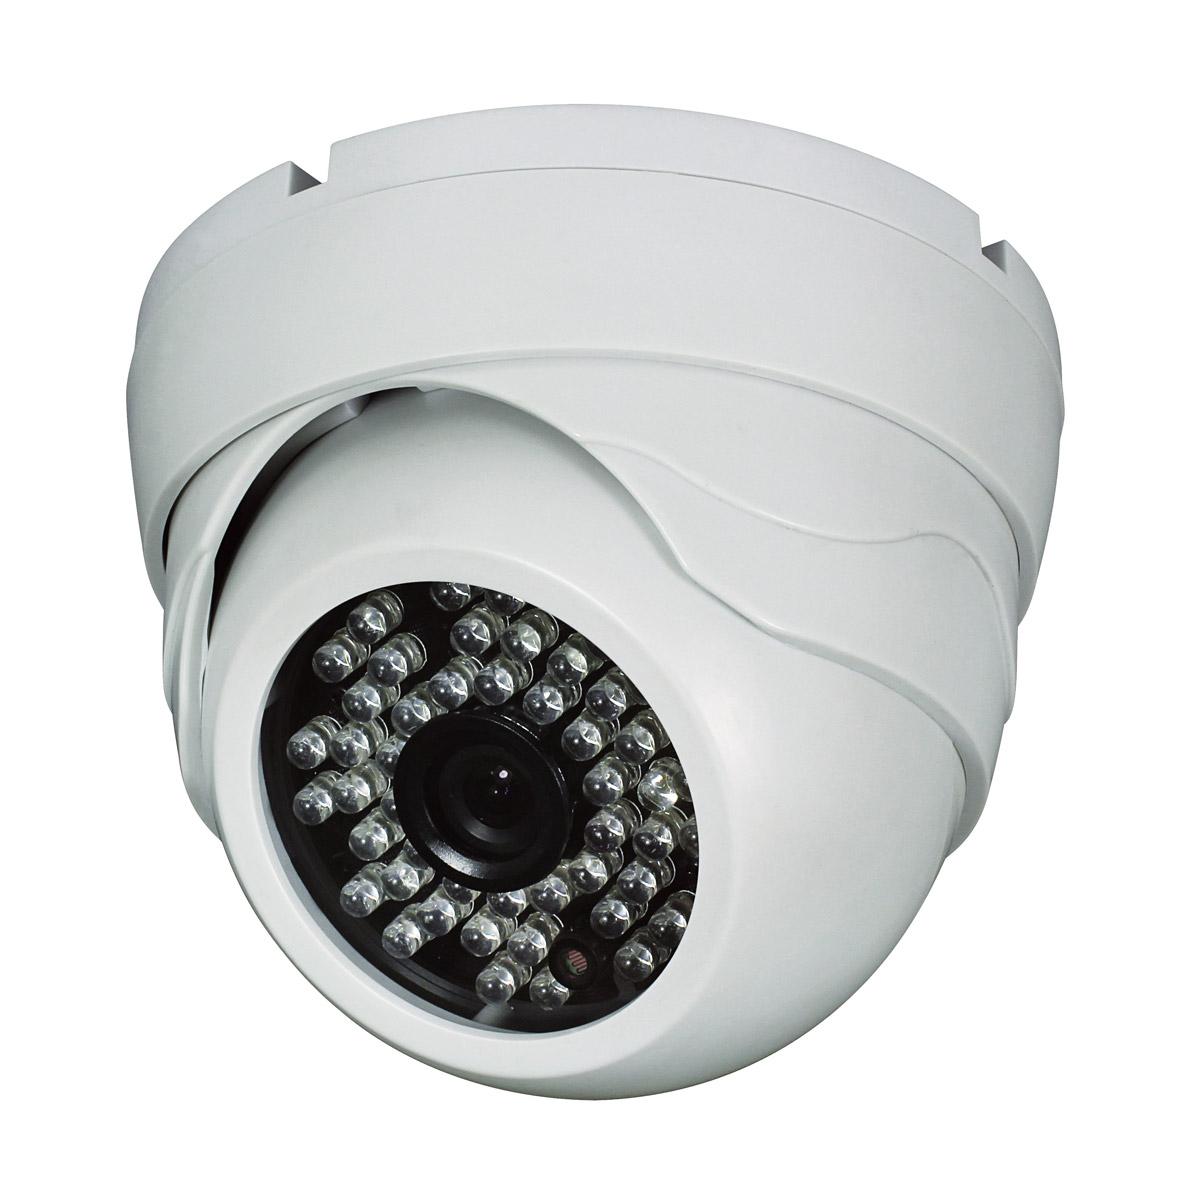 cctv cameras,alarm system,dstv installation, video intacom, t.v. bracket on mount, electrical problems, New installation and older, electric